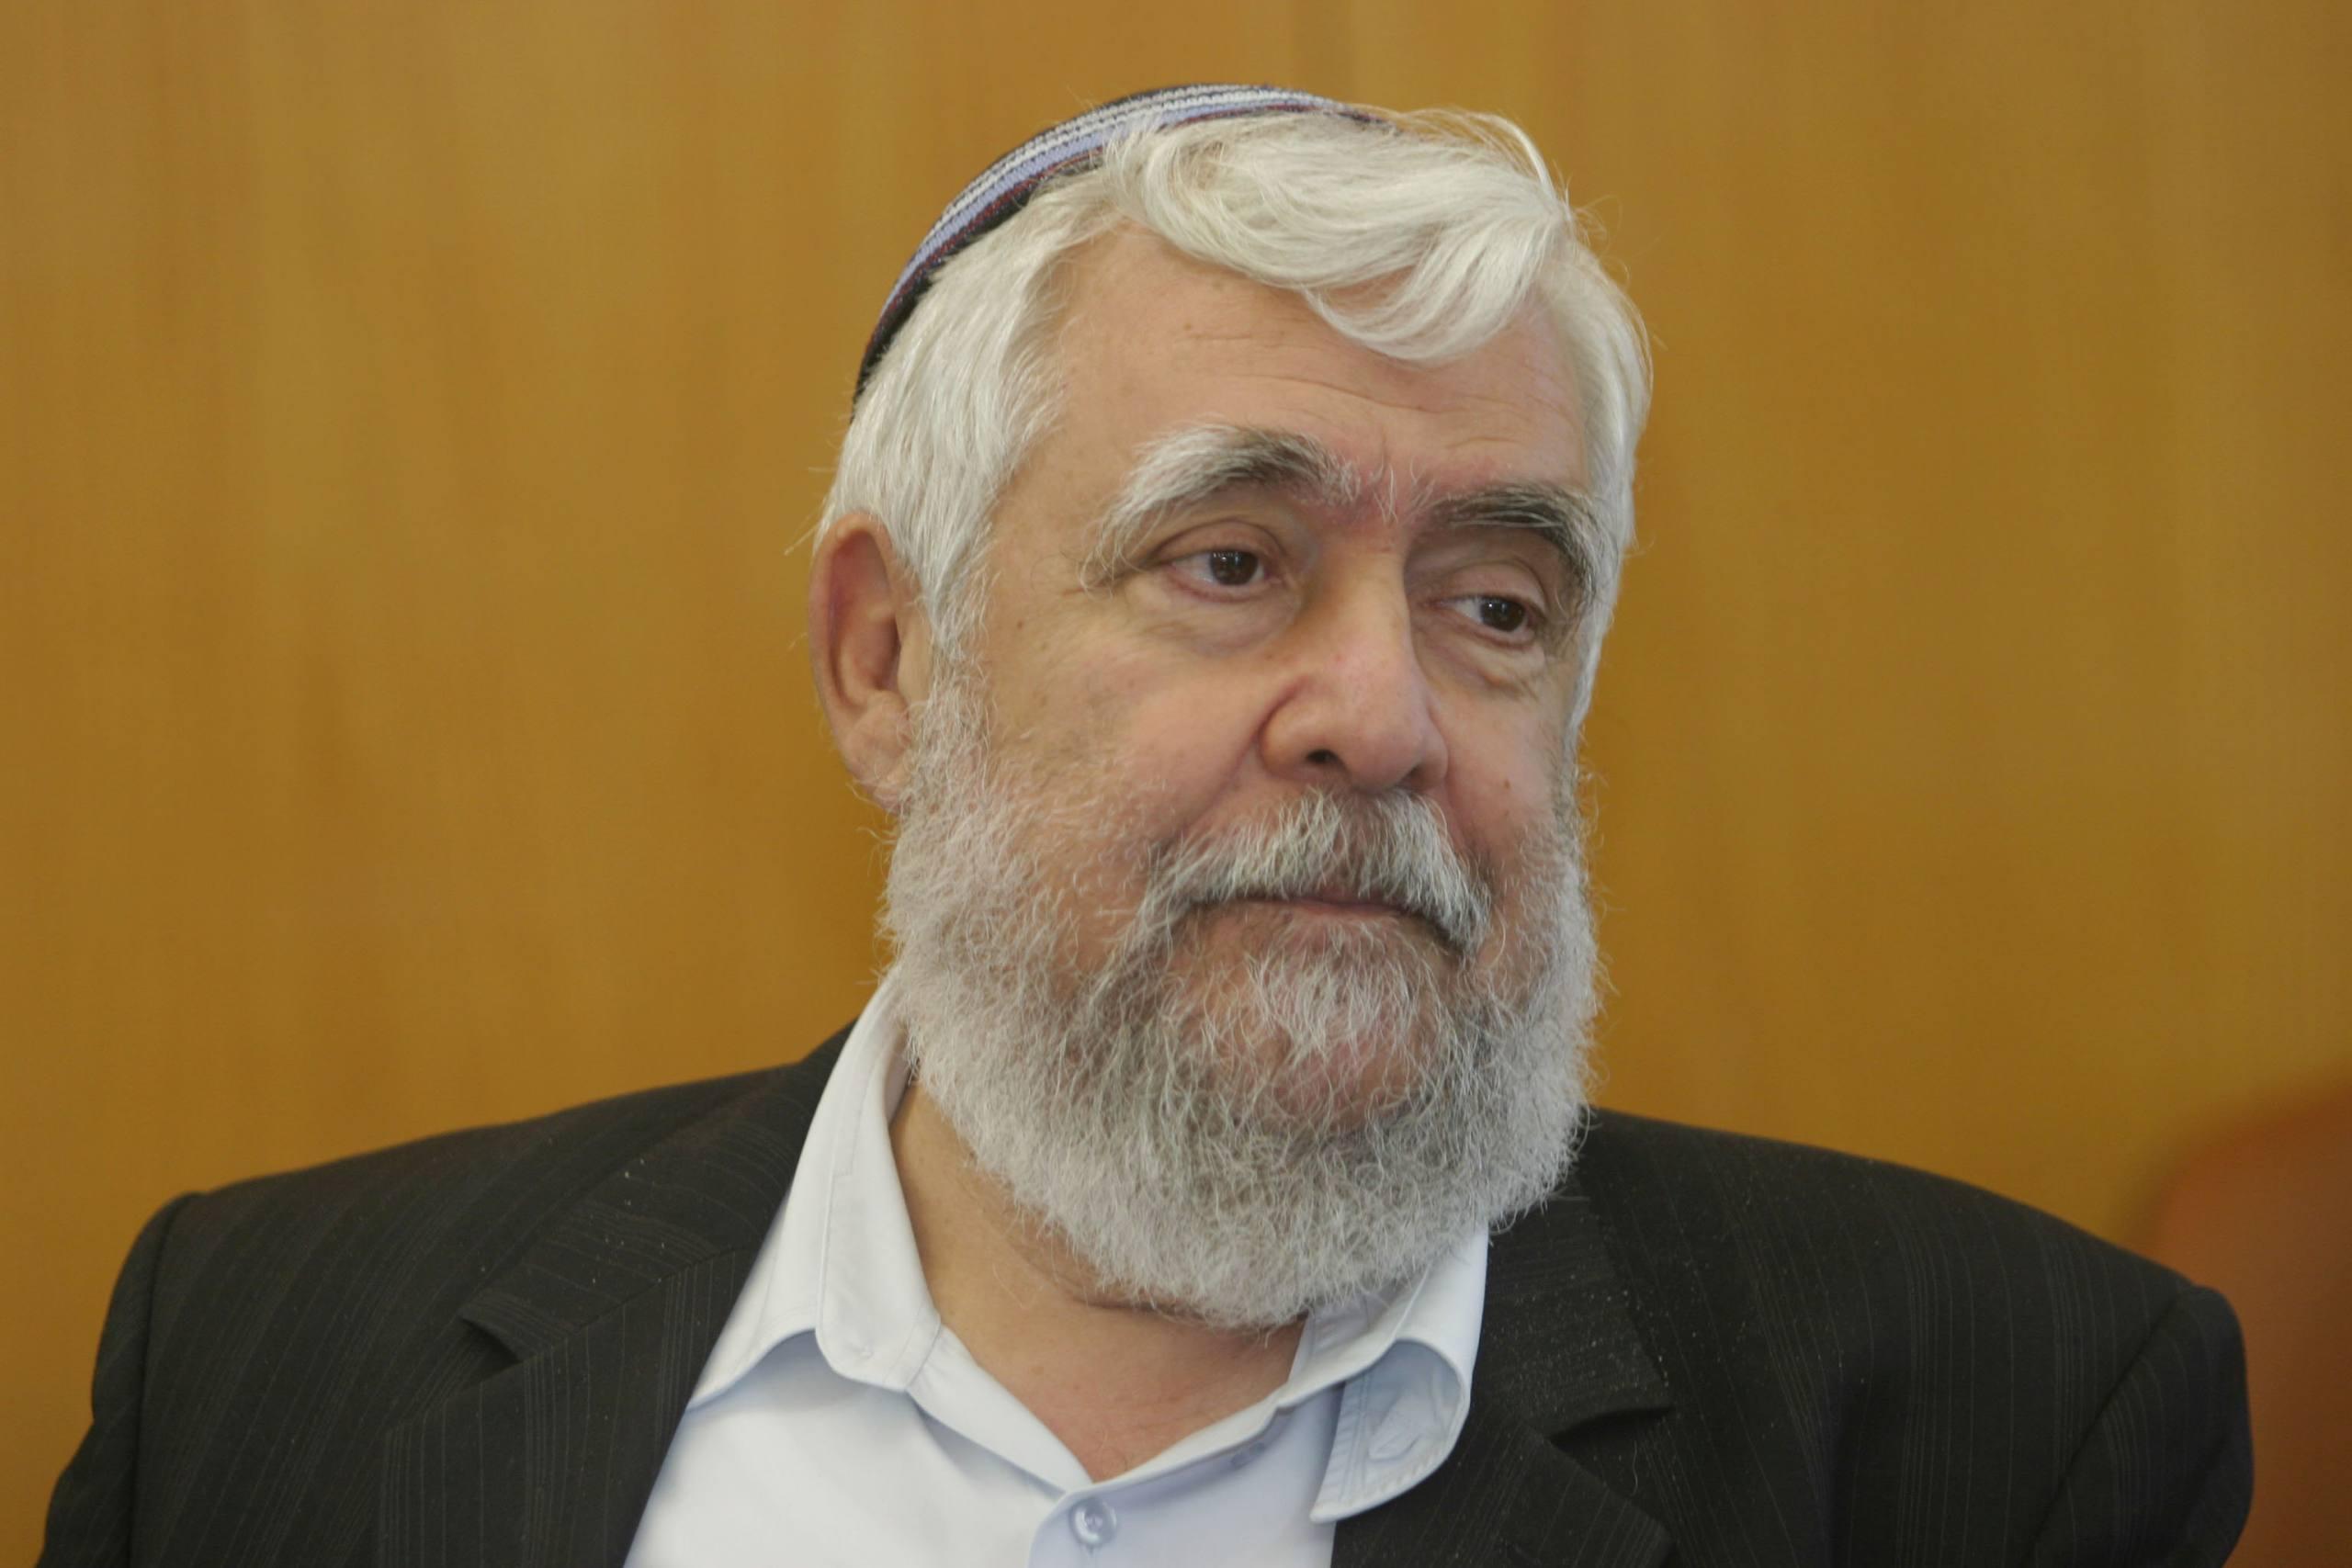 Portrait of Israeli Knesset member Yitzhak Levy during Knesset meting . Photo by Orel Cohen/FLASH90  *** Local Caption *** ôåøèøè çáø ëðñú éöç÷ ìåé